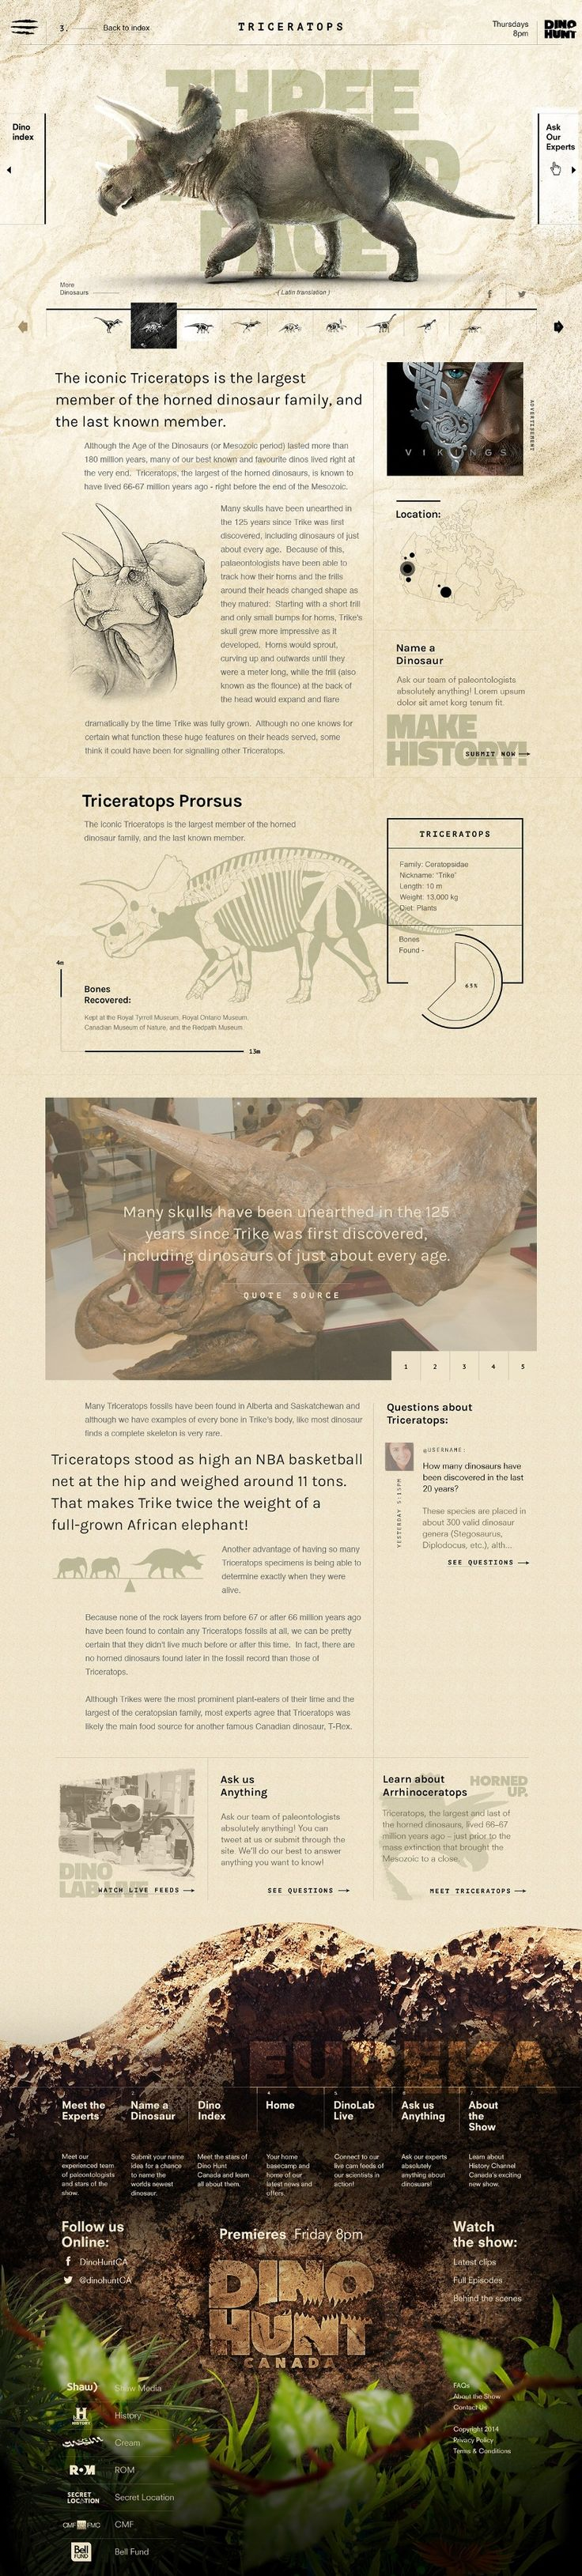 Dino Hunt. A dream community for dinosaur lovers.